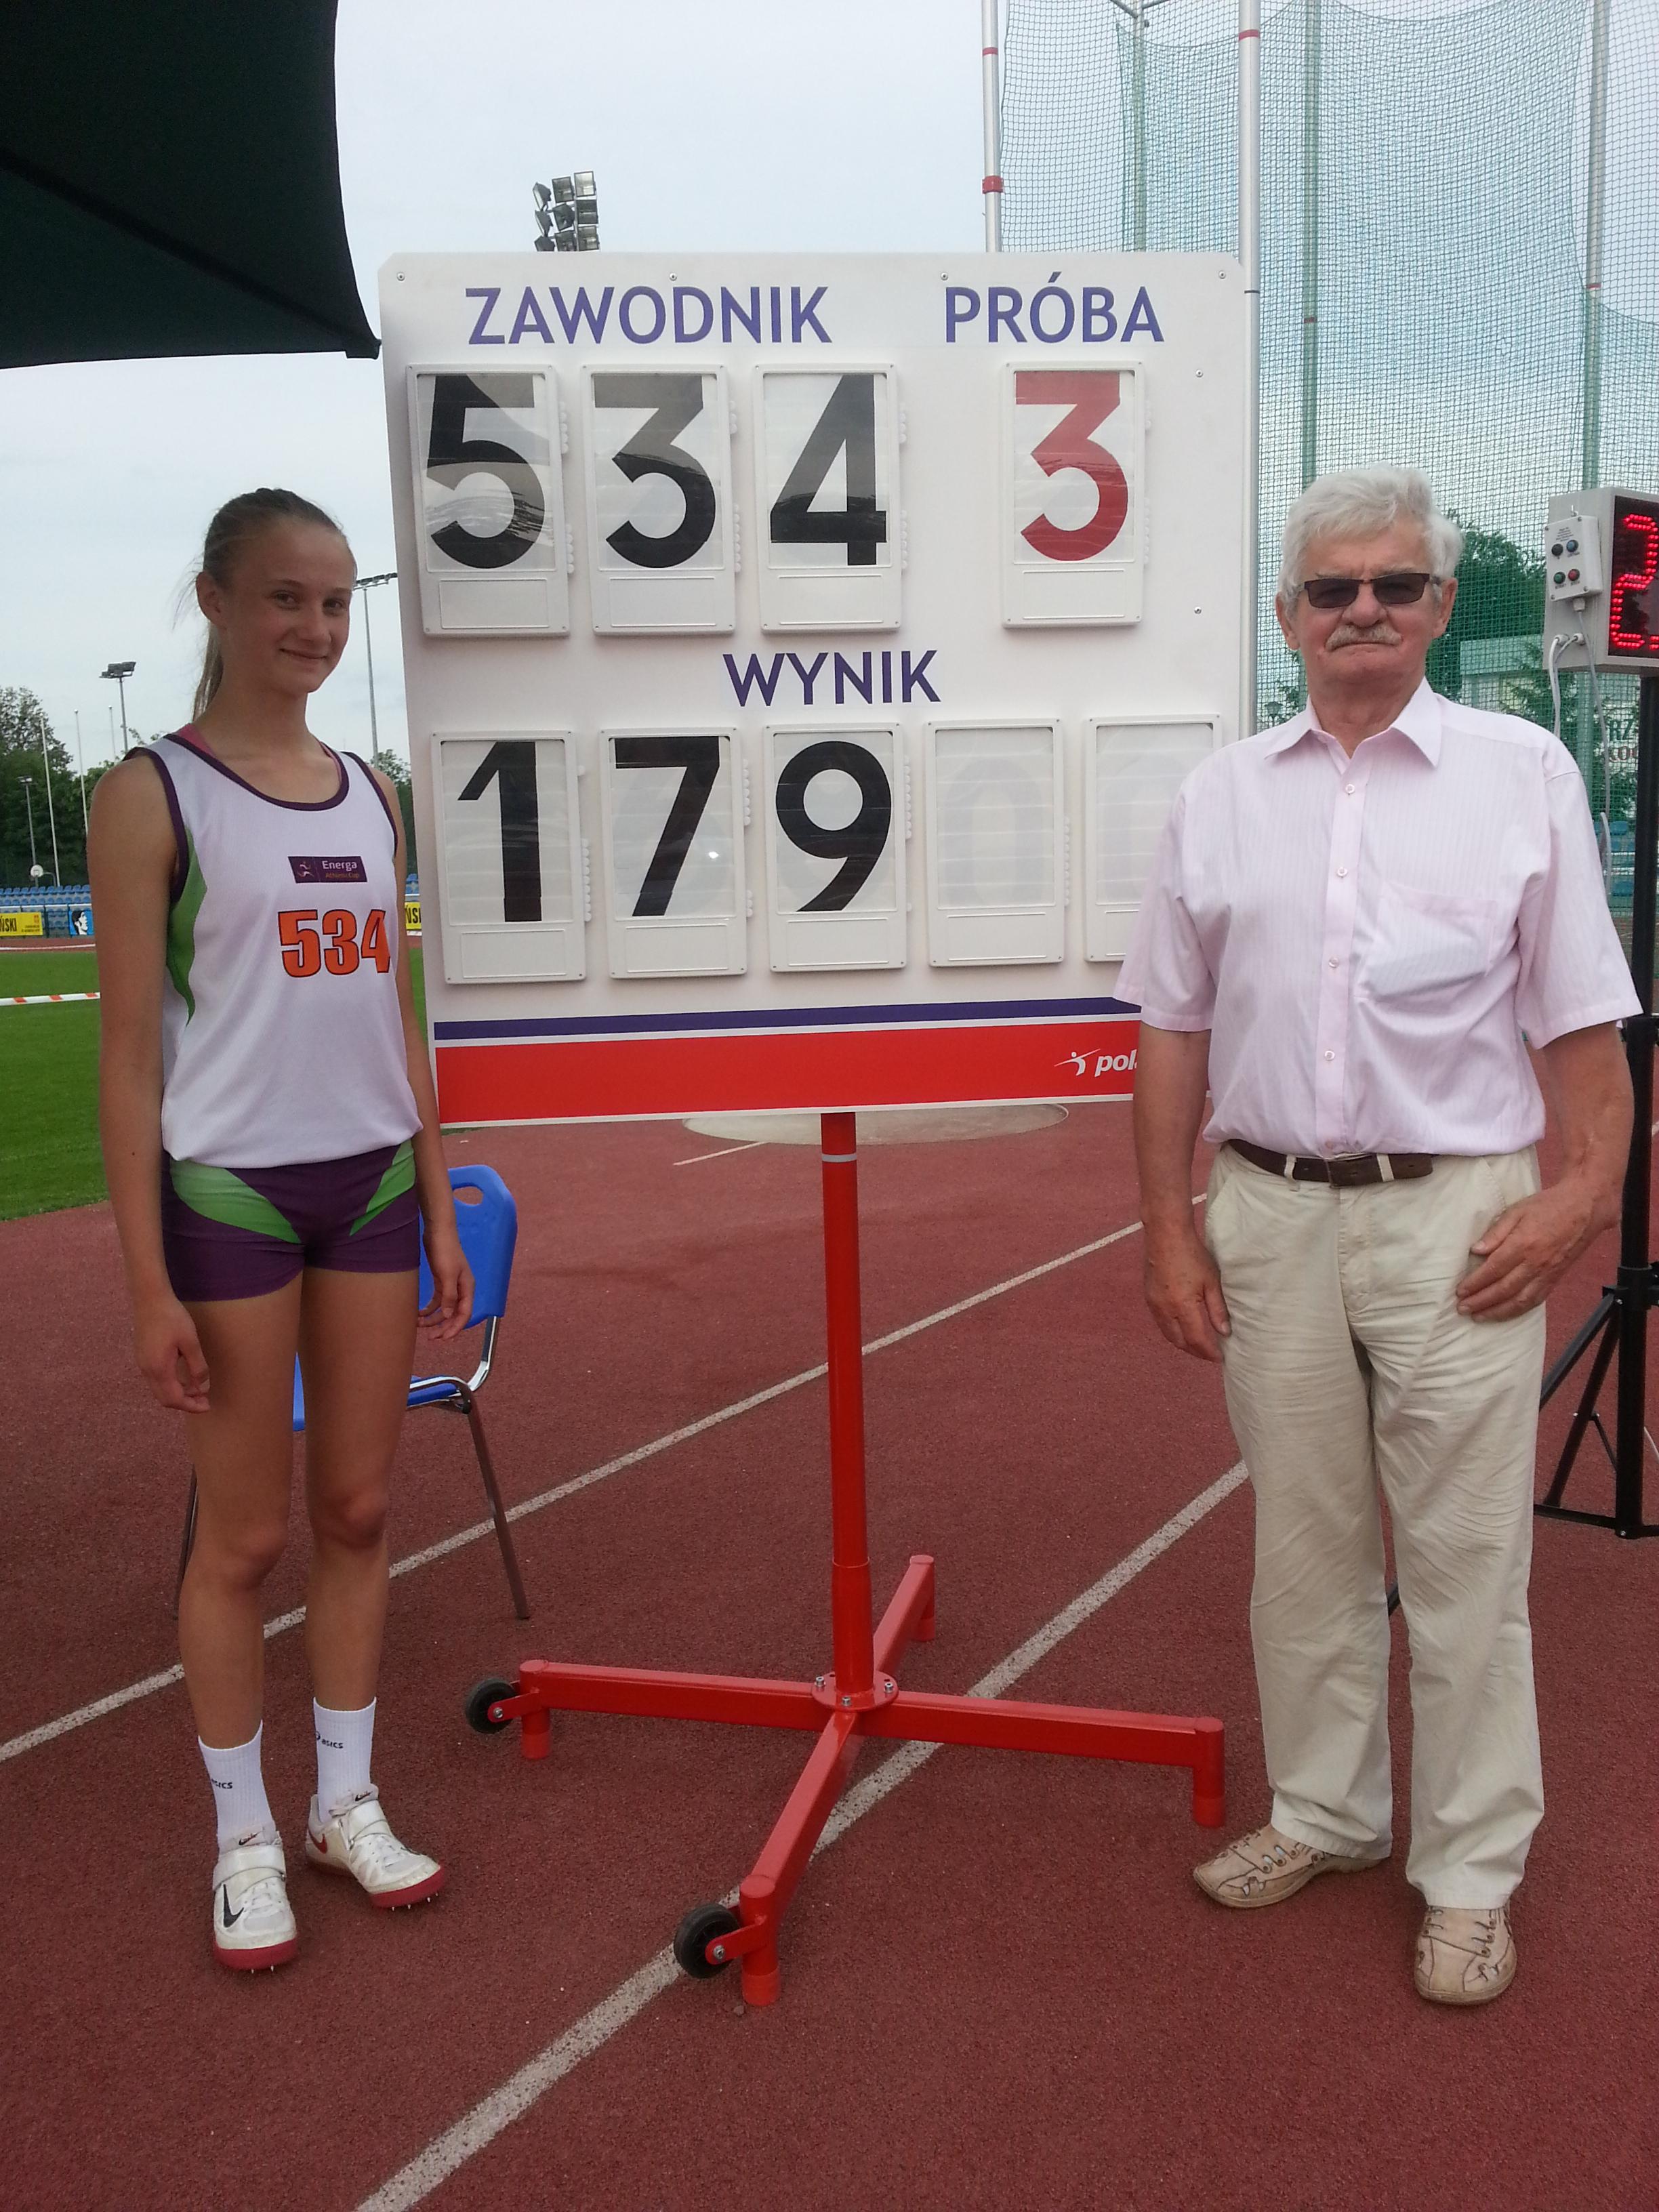 Paulinai trener Piotr Kaczmarek